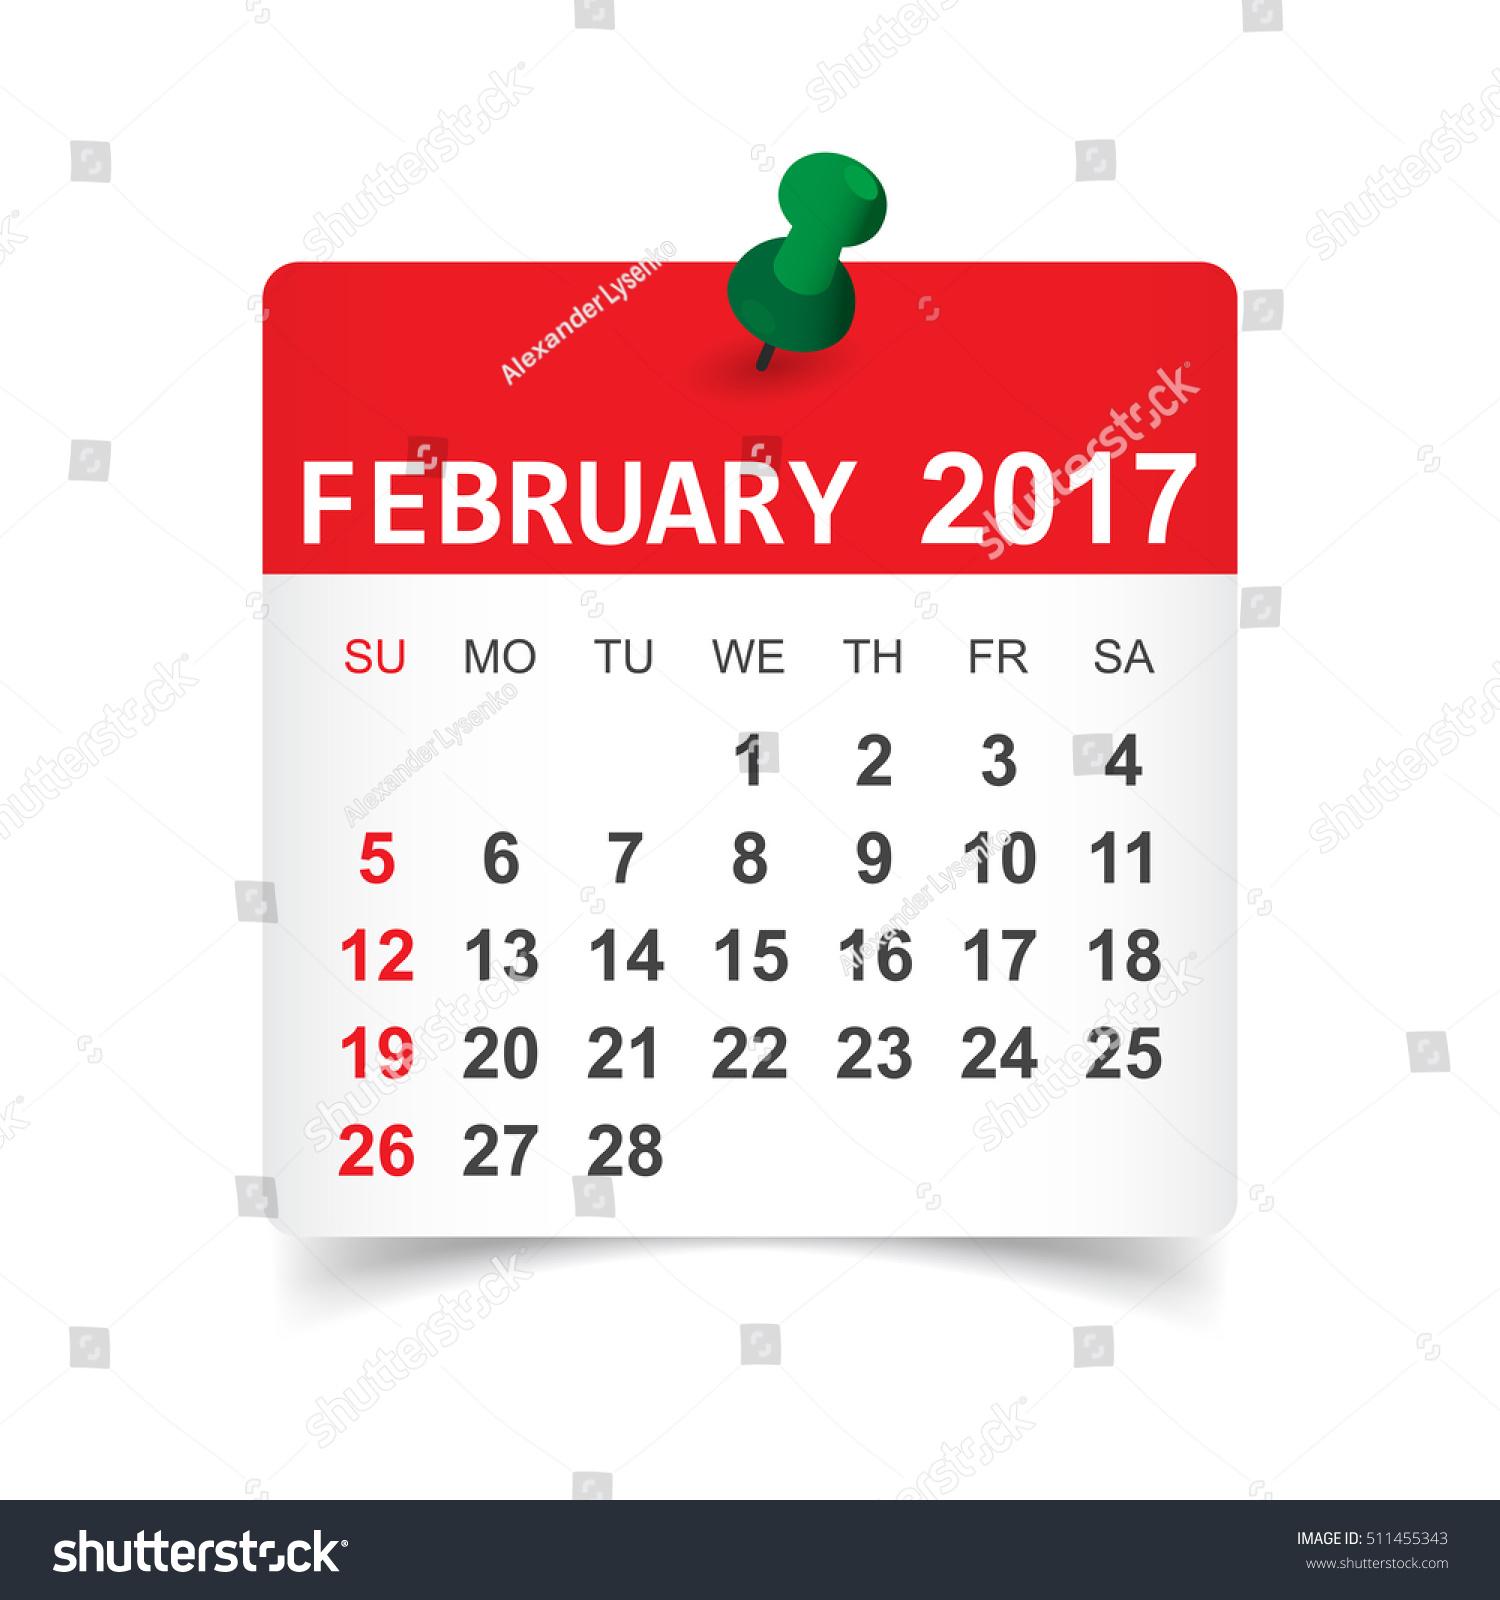 February Calendar Illustration : February calendar vector illustration stock